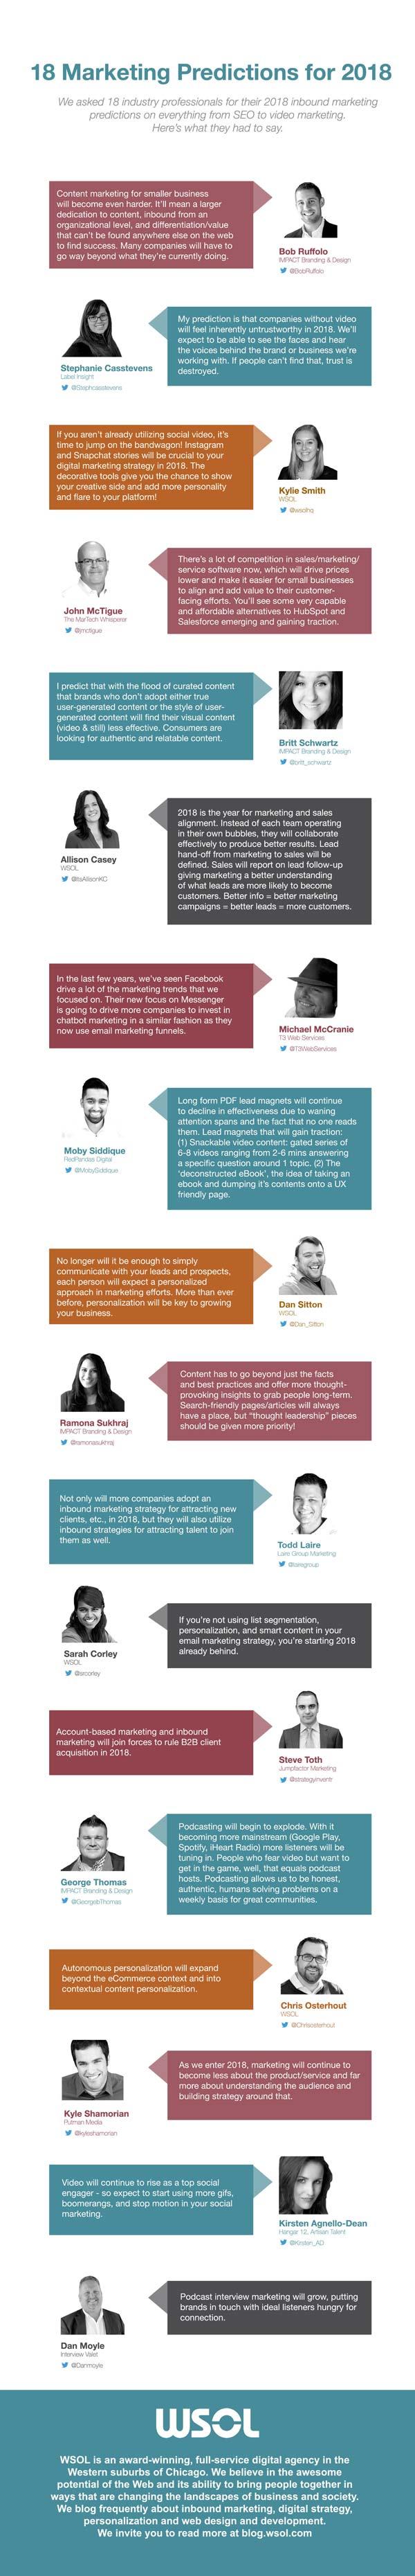 marketing-predictions-2018.jpg